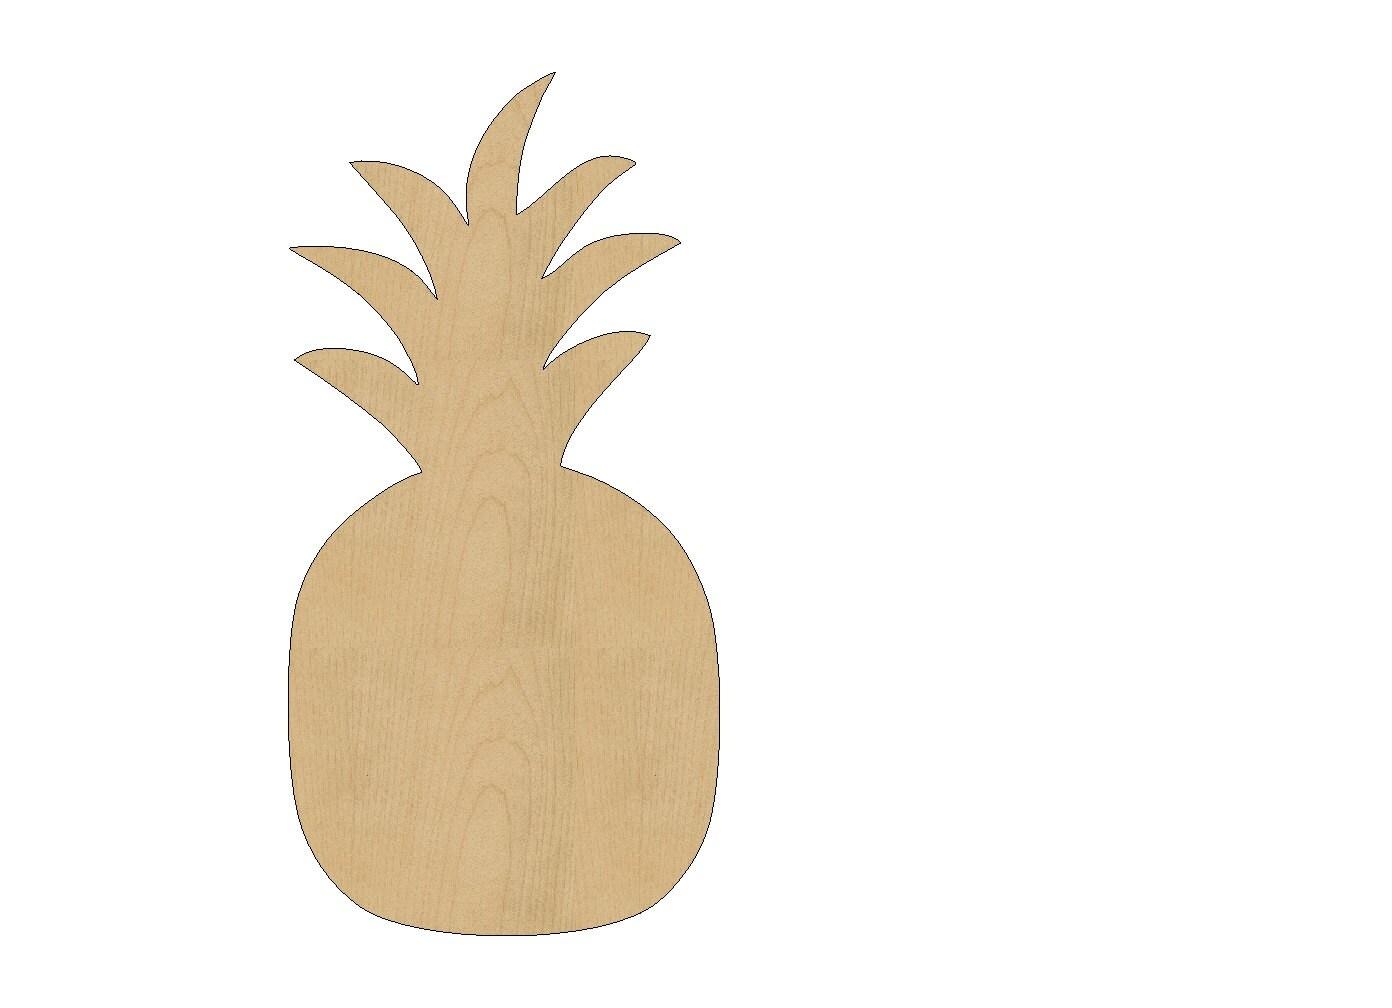 pineapple cutout shape laser cut unfinished wood shapes craft